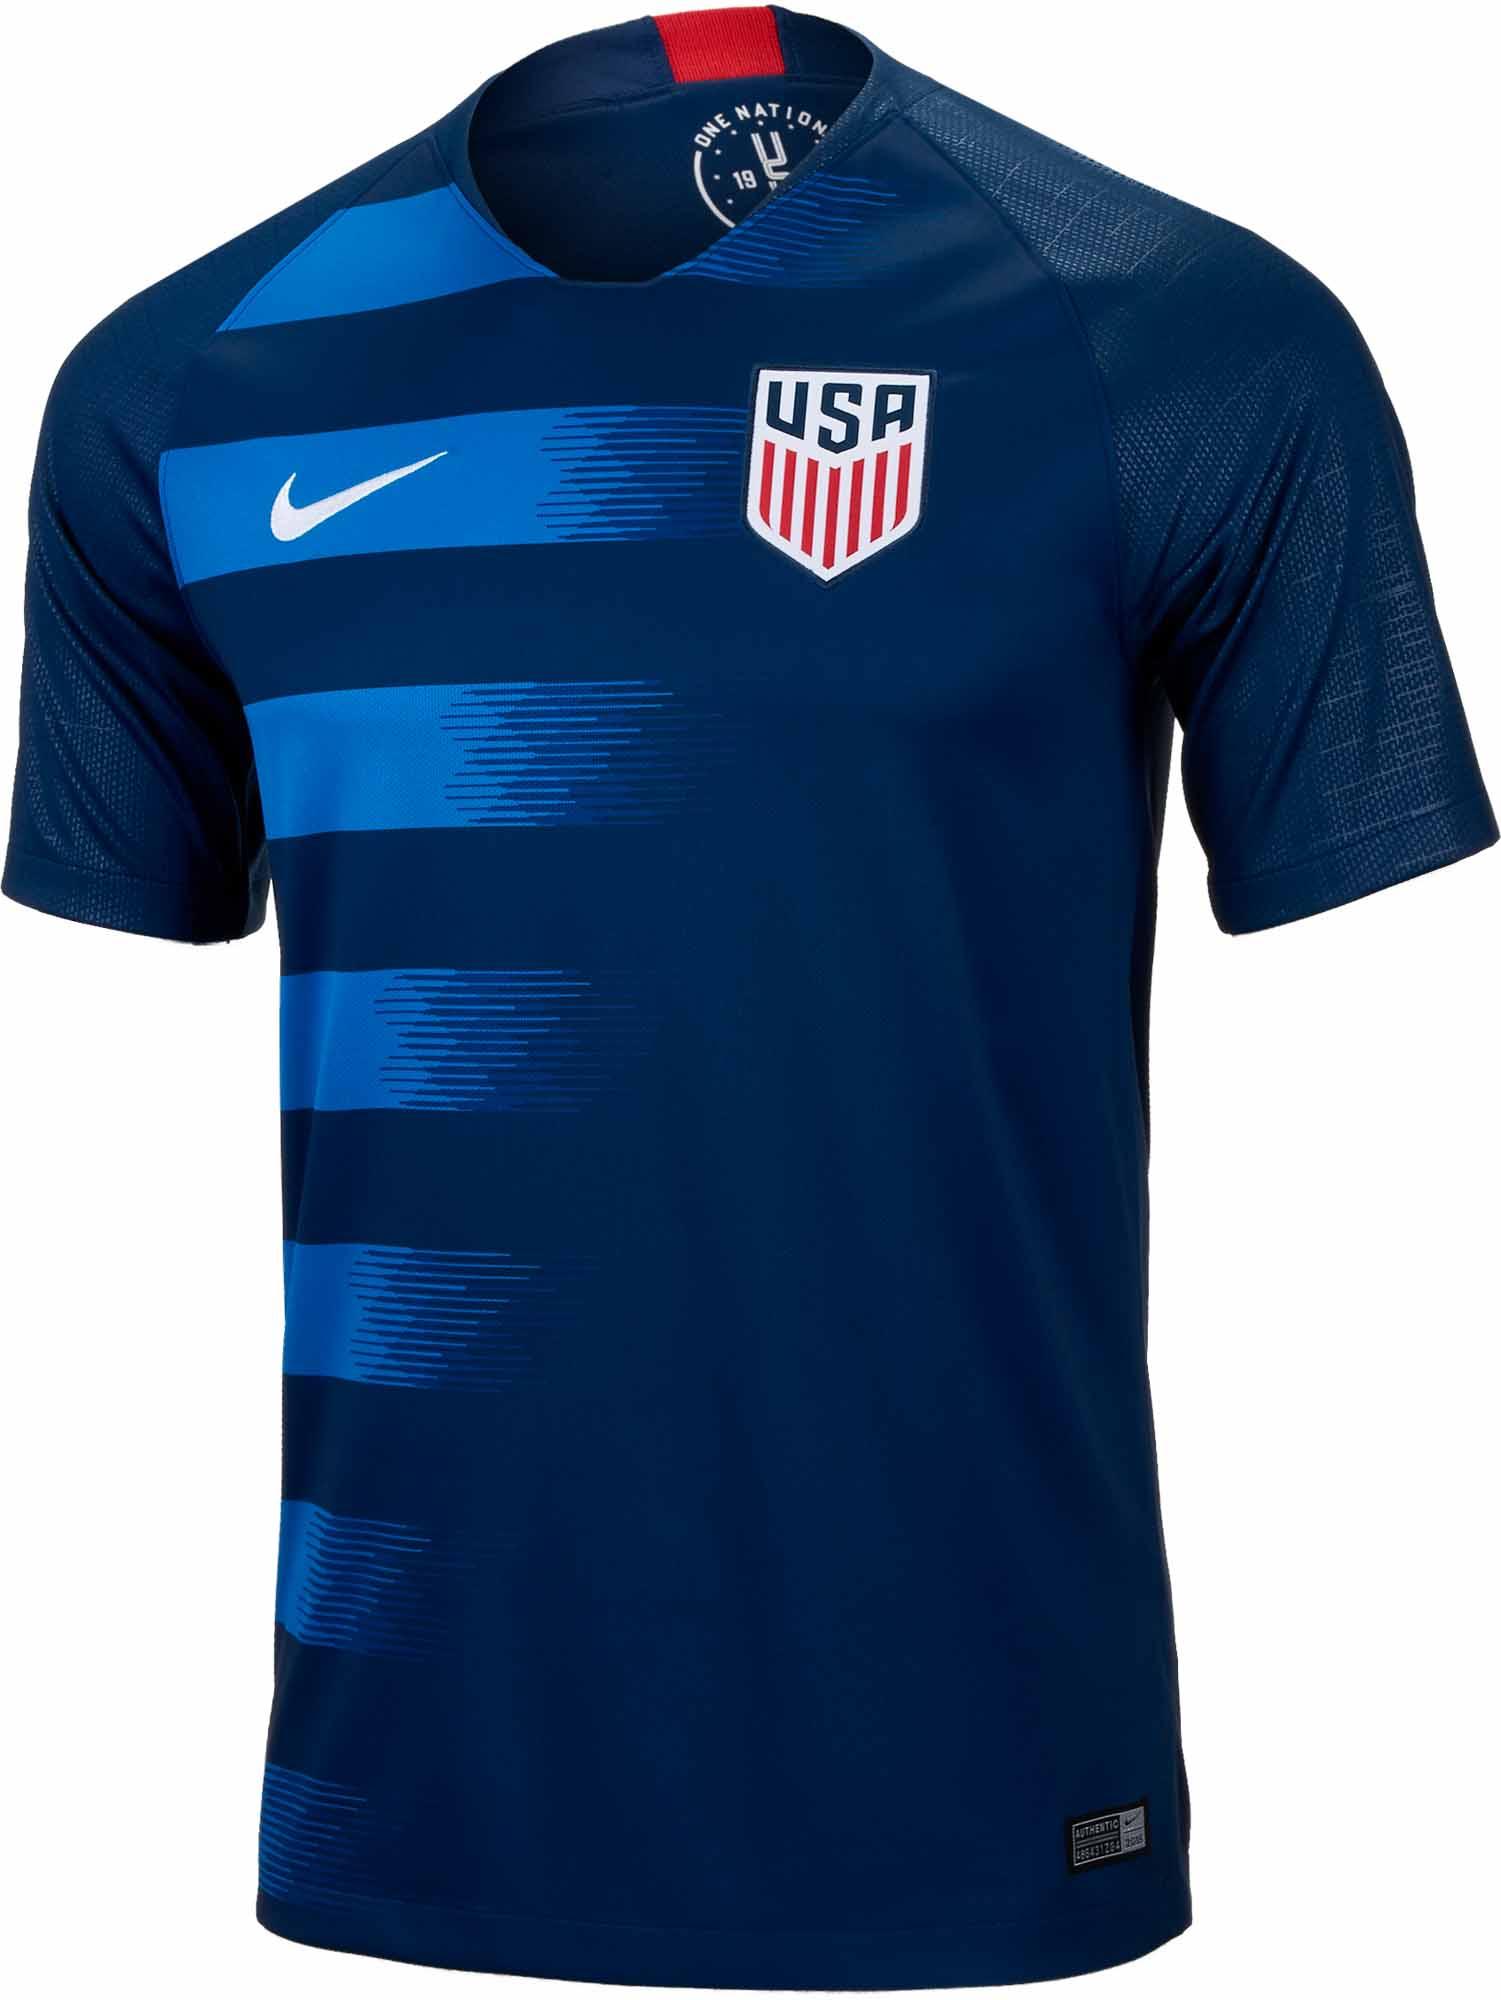 45146a8db Nike USA Away Jersey 2018-19 - from SoccerPro.com